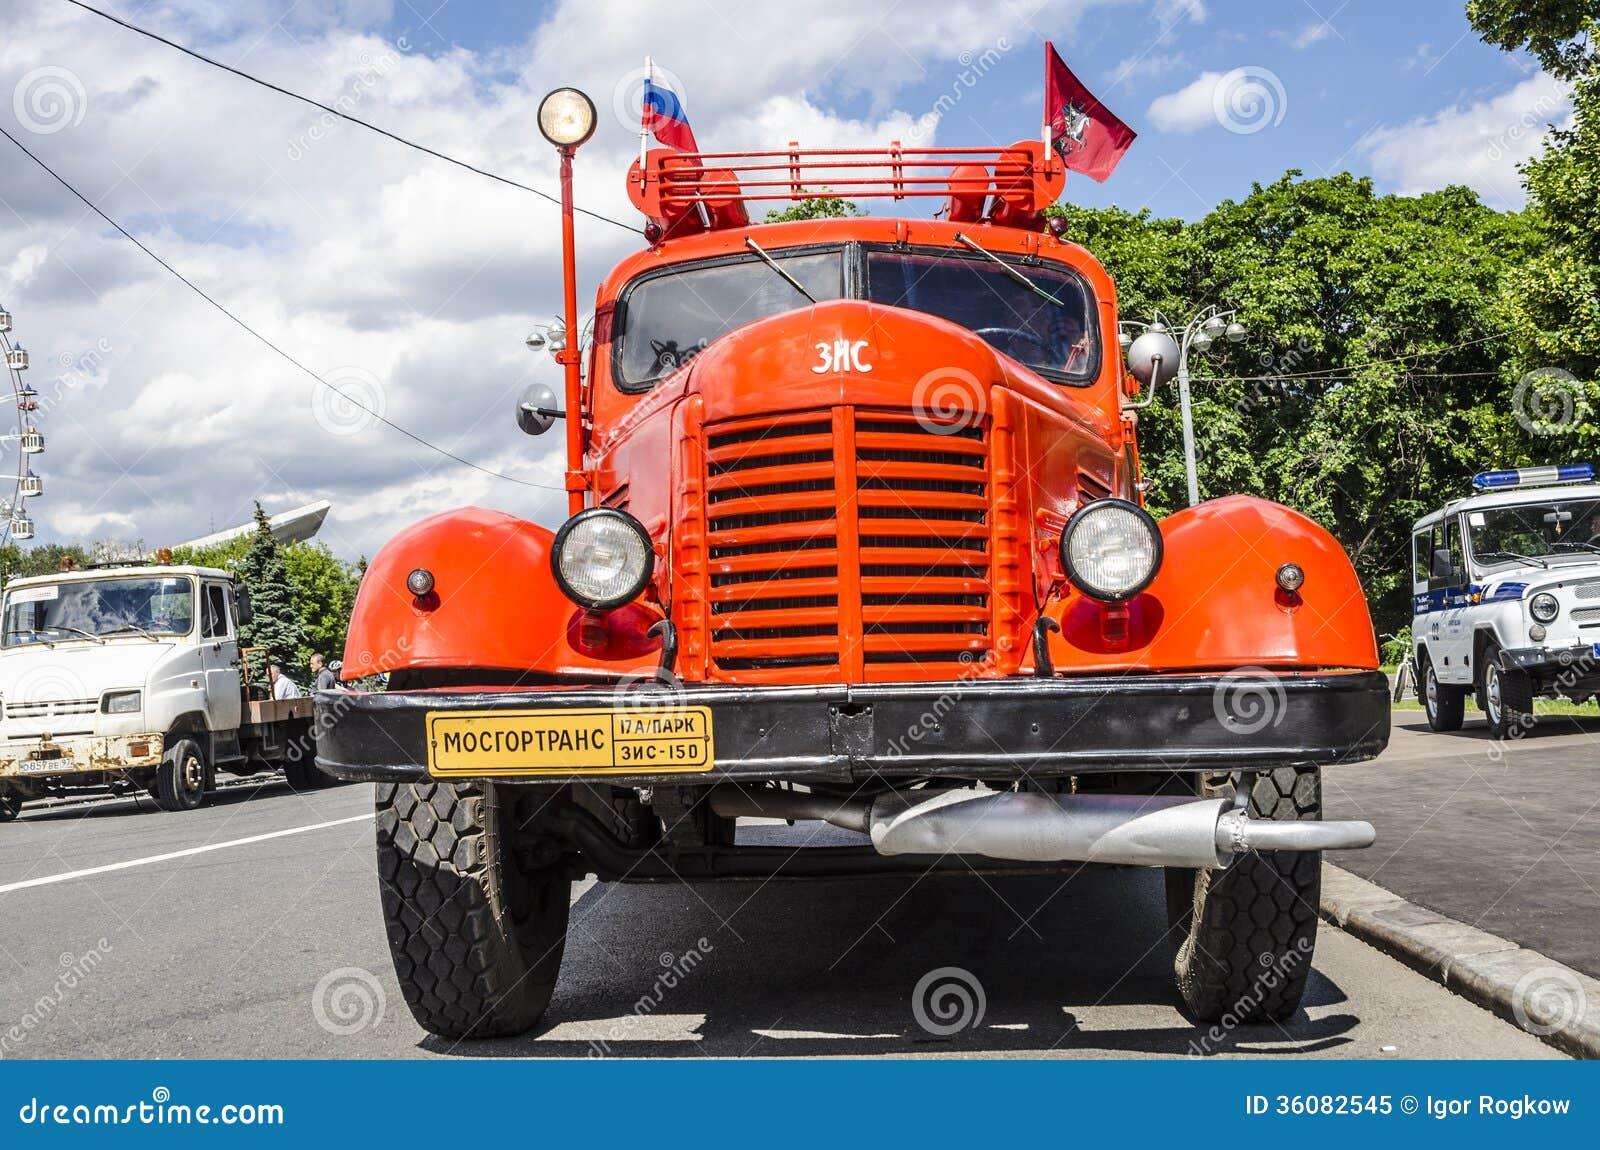 marque russe sovi tique rare vms de camion de pompiers image ditorial image 36082545. Black Bedroom Furniture Sets. Home Design Ideas